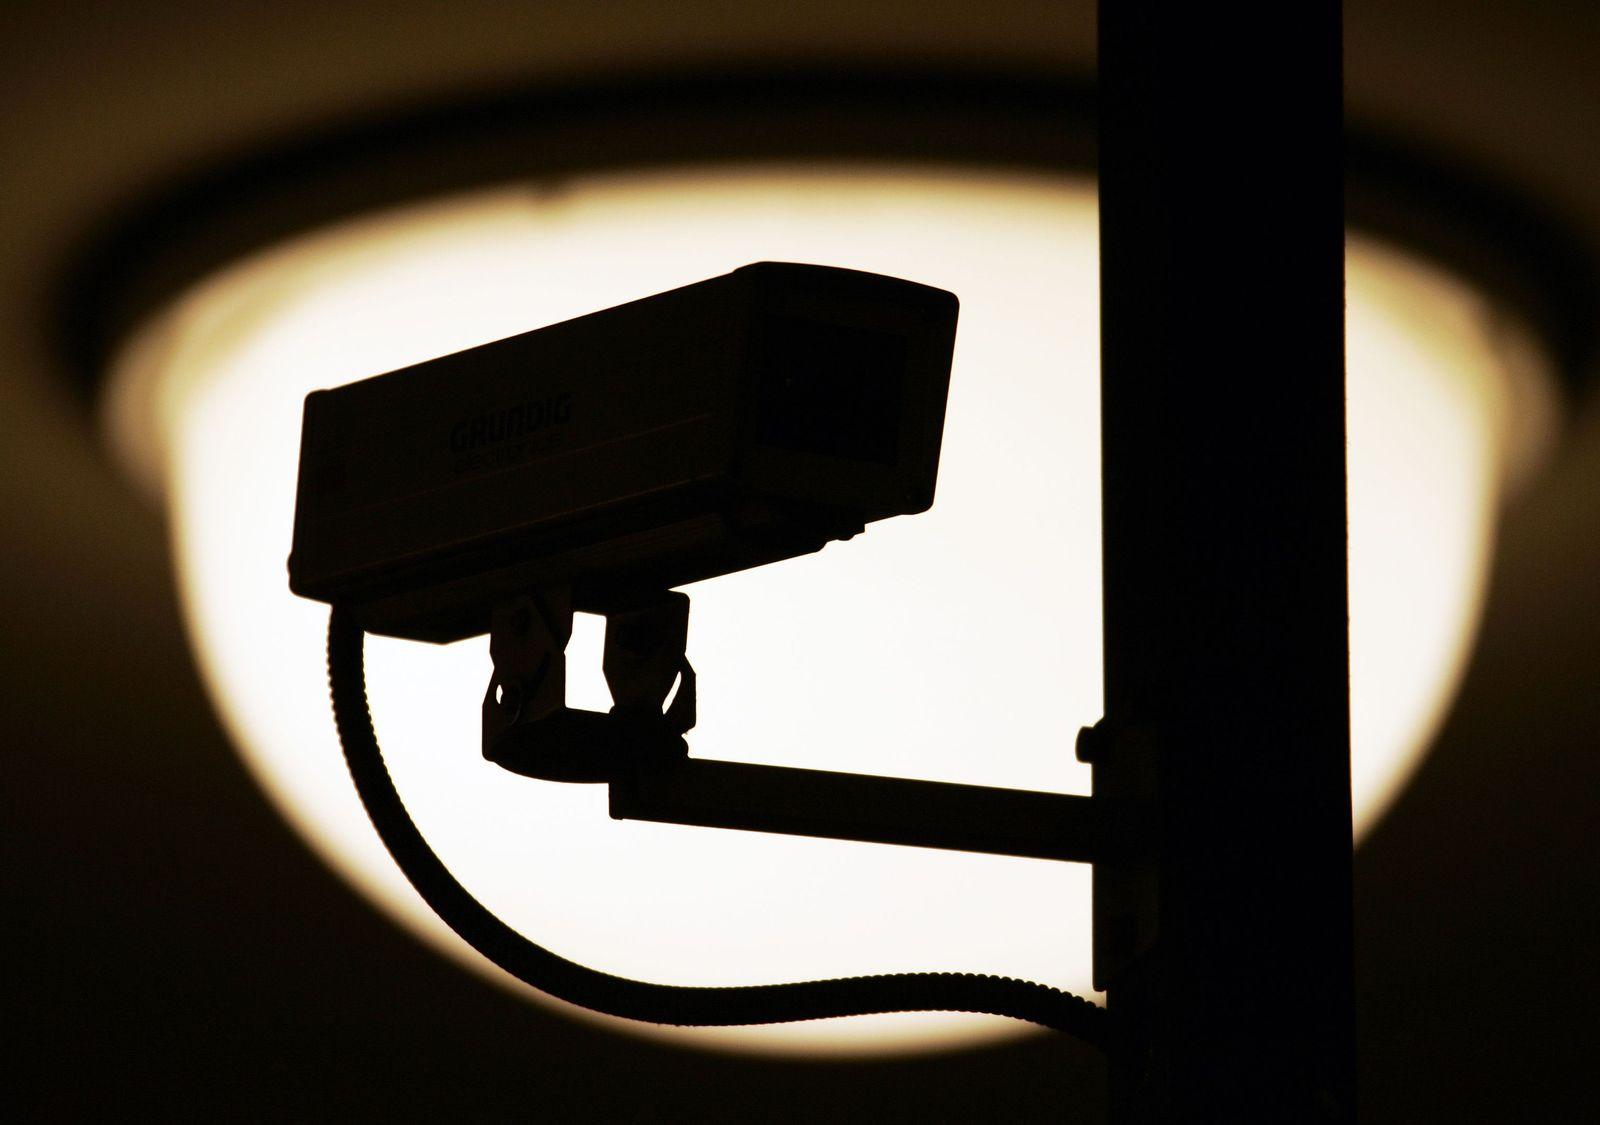 Überwachungskamera / Videoüberwachung